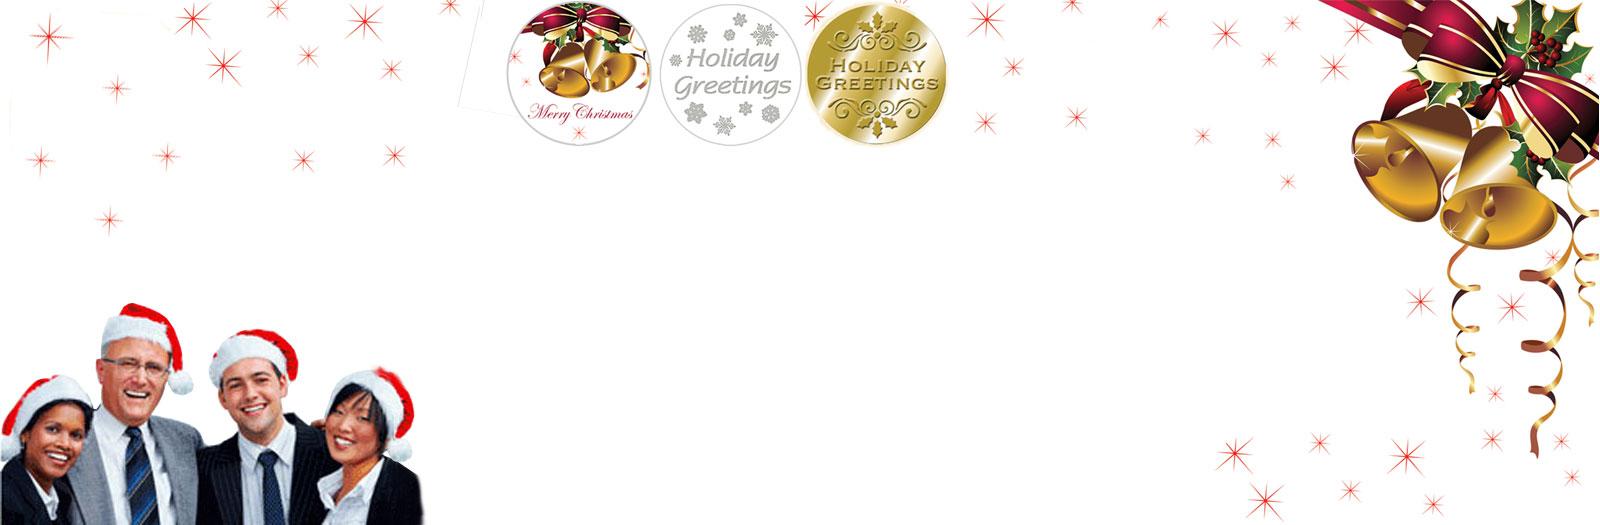 Holiday-Banner-3-seals